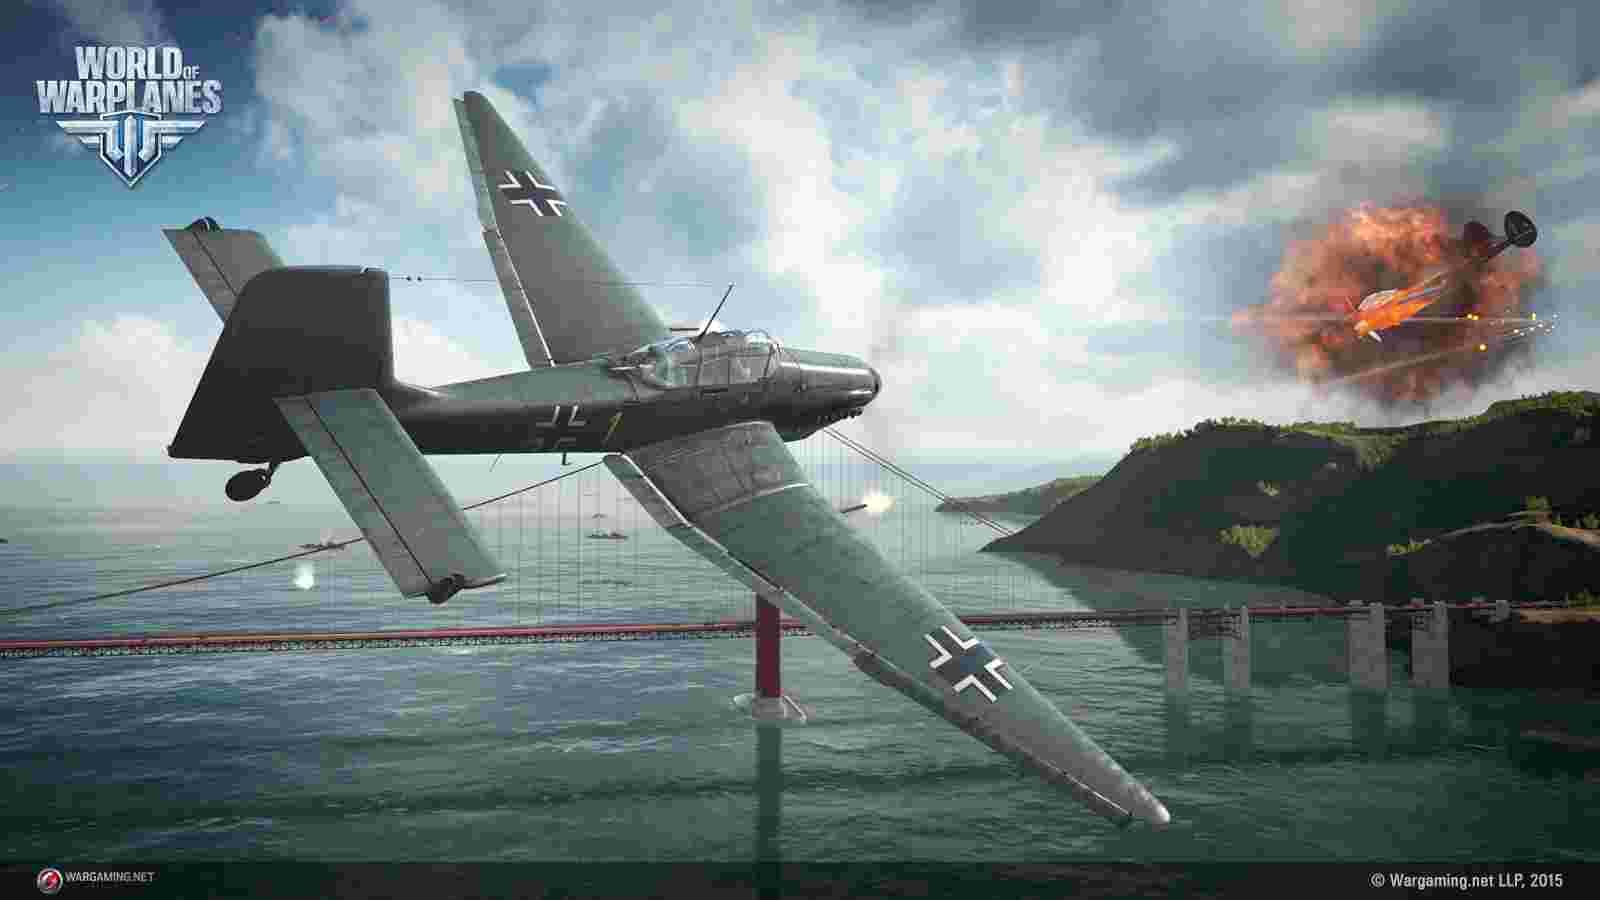 WoWP_Screens_Warplanes_Image_05